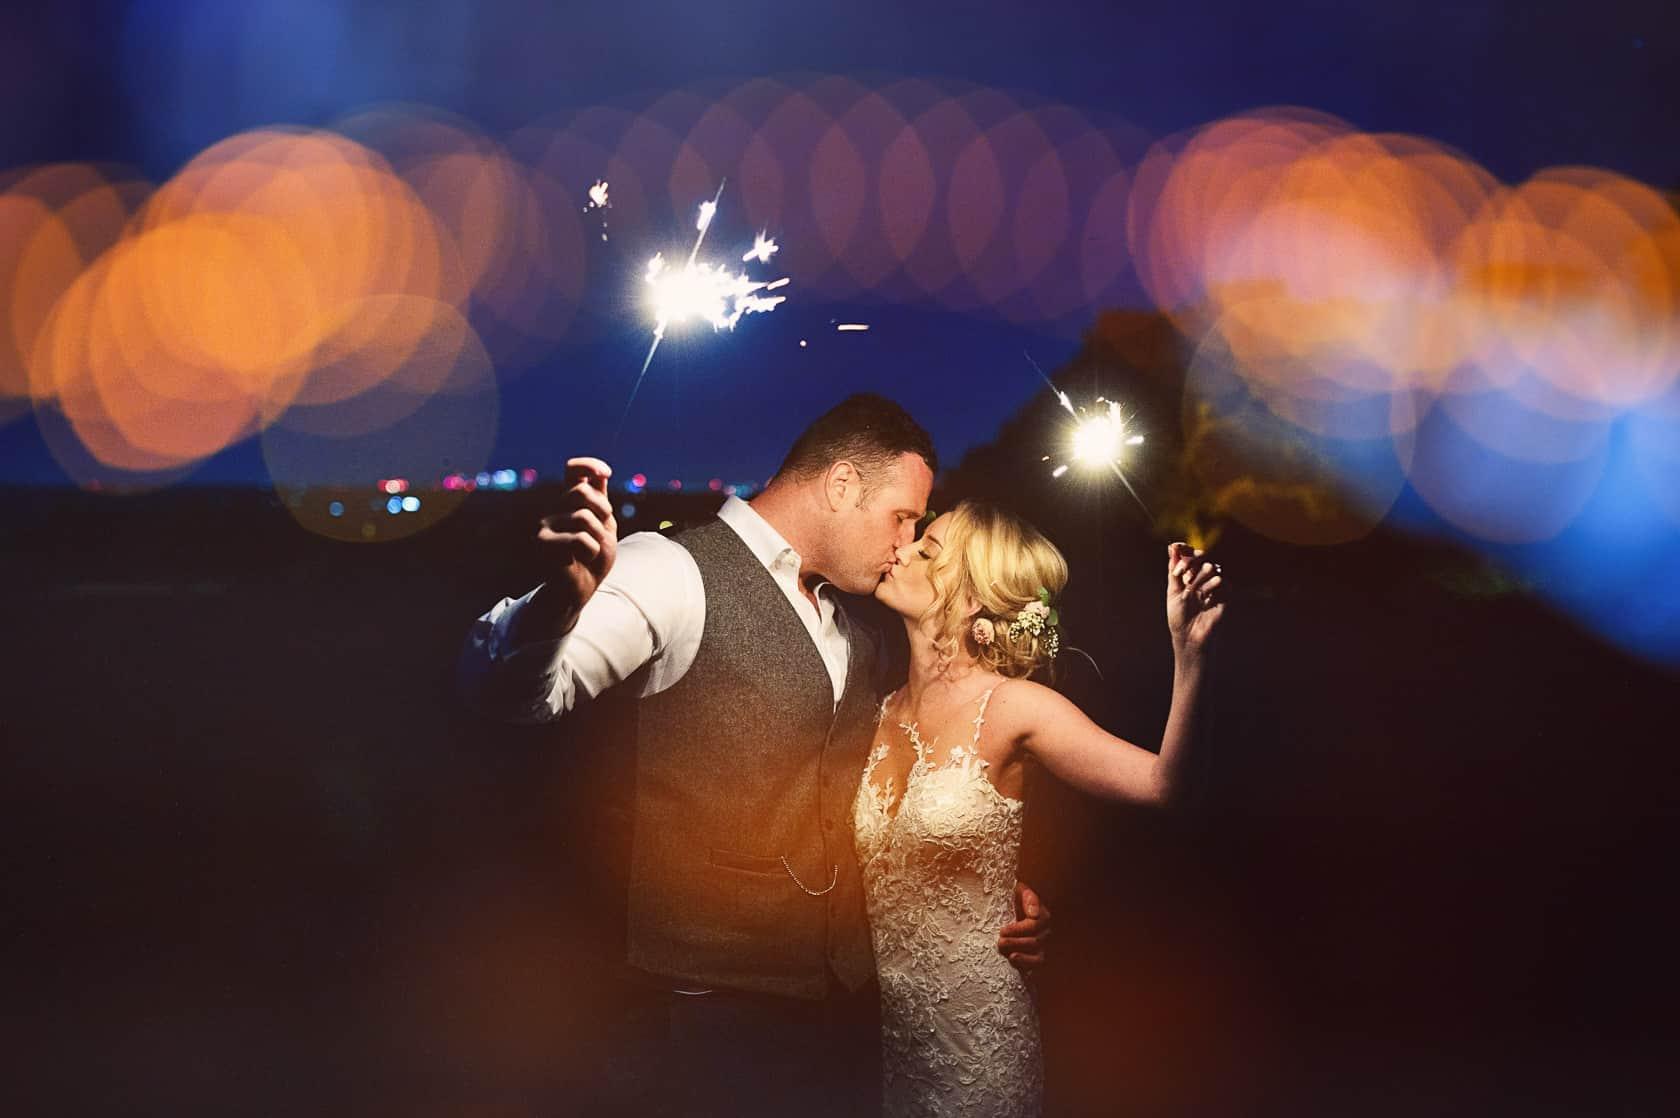 Best_Wedding_Photography_2019_Wedding-Photographer-Essex_003